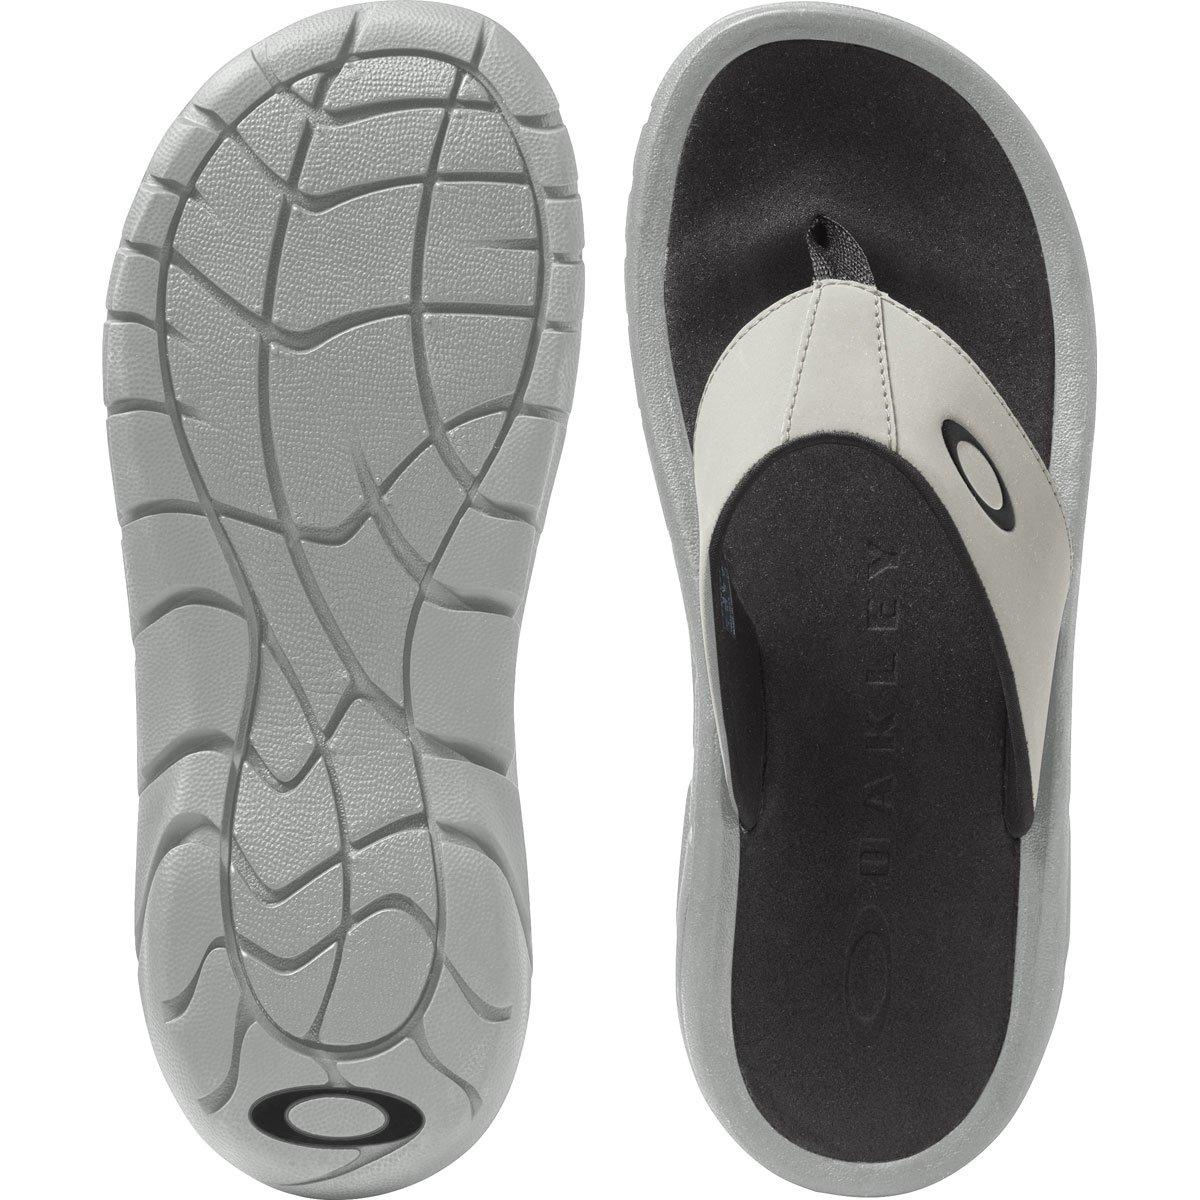 Oakley Men's Supercoil 2.0 Sandals,11,Stone Gray